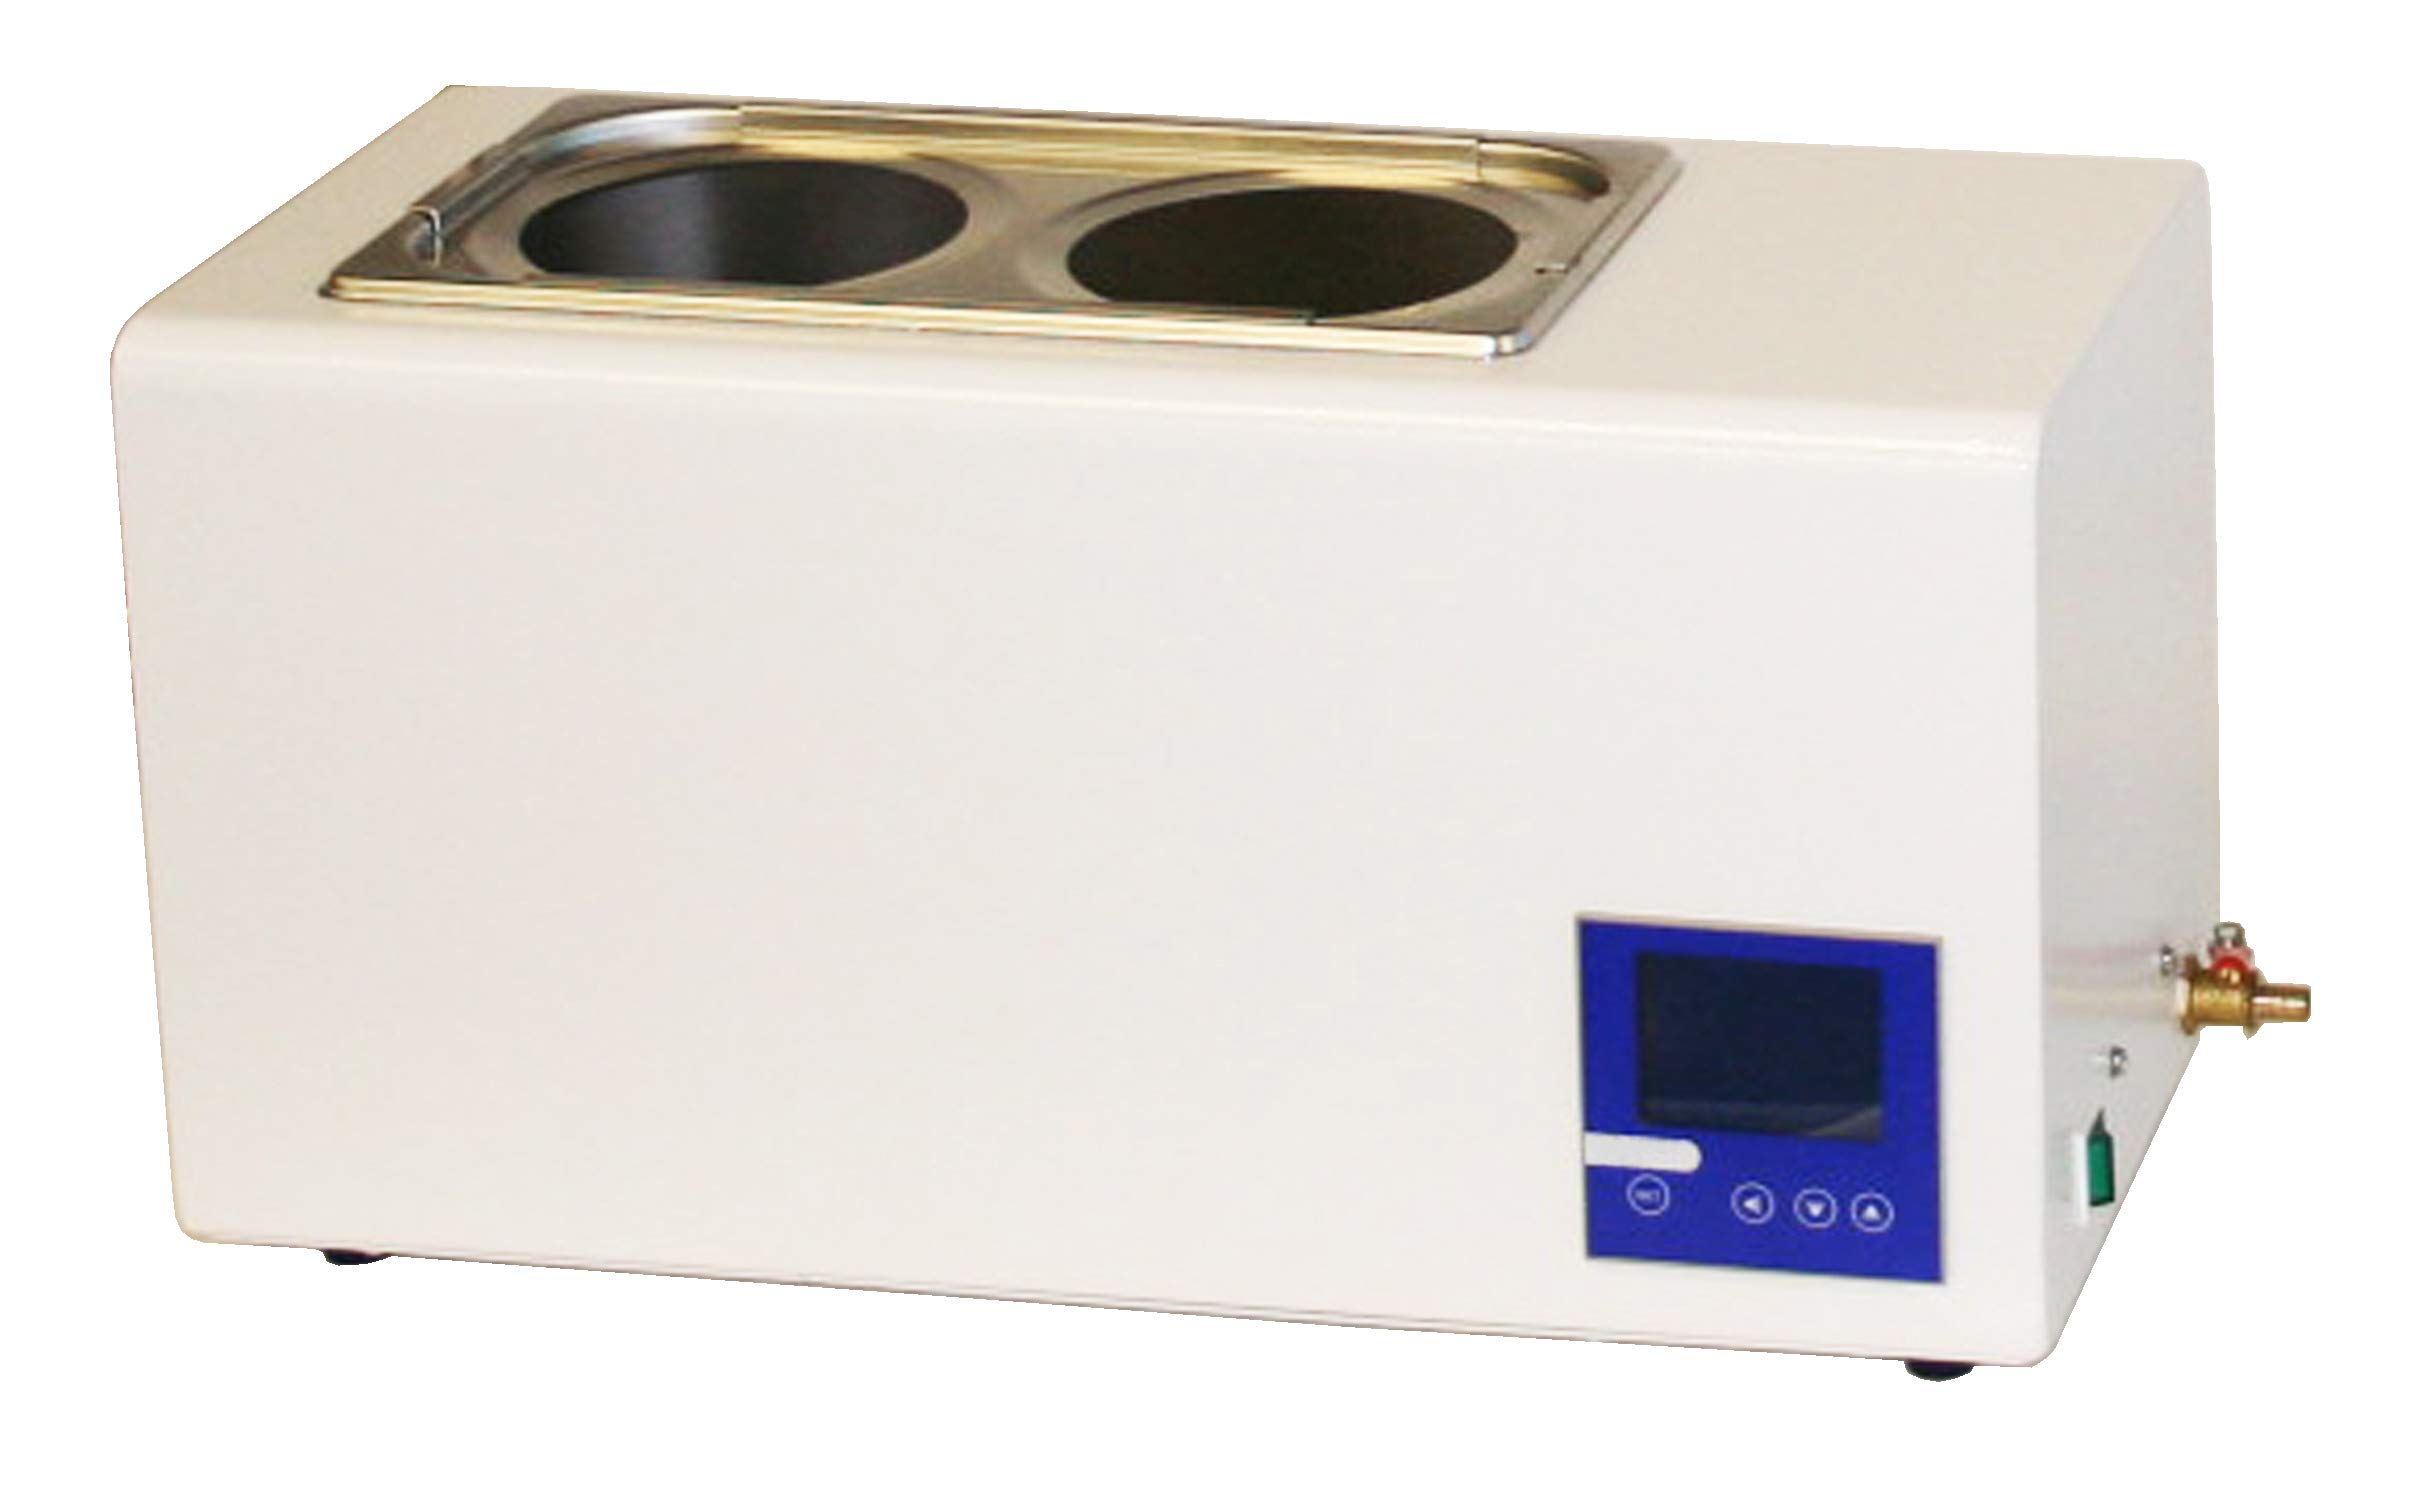 Jackson Global JS-HW-4L Digital Water Bath   Capacity:4 Liter   Temperature Range: 5-99 ºC   Voltage: 110V / 50-60Hz   Temperature Fluctuation: ±0.2 ºC